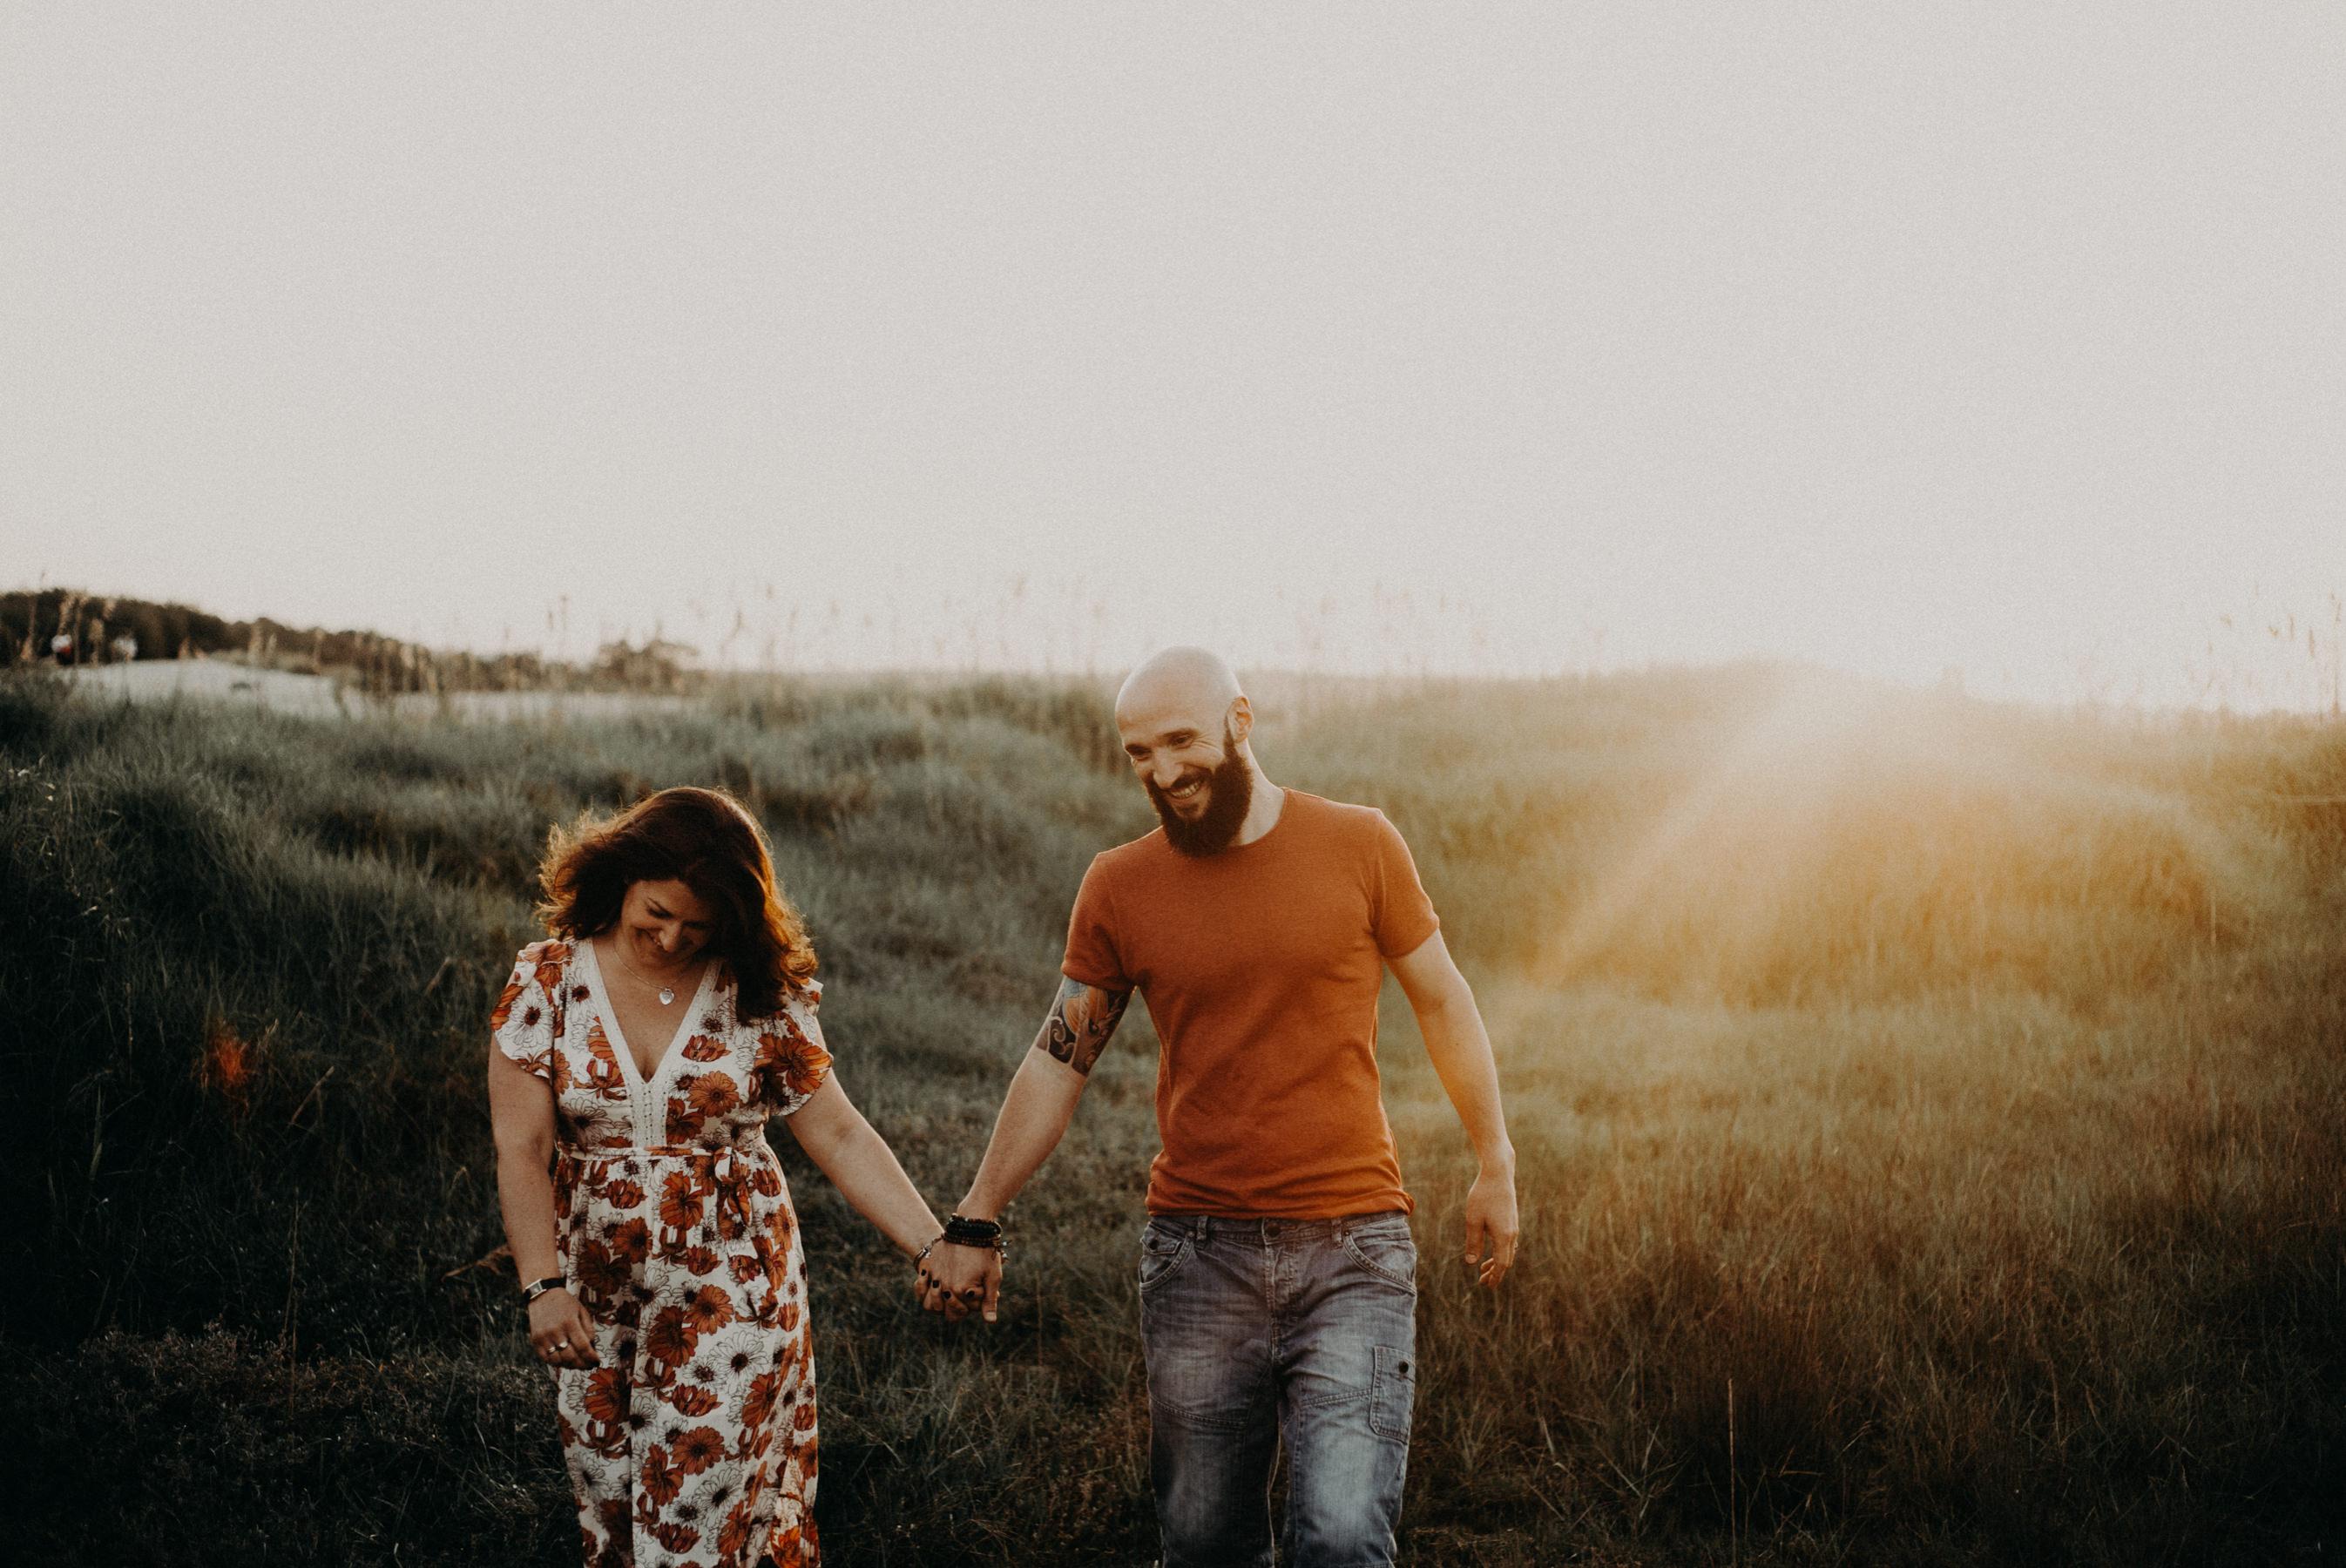 Photographe seance couple la hume plage